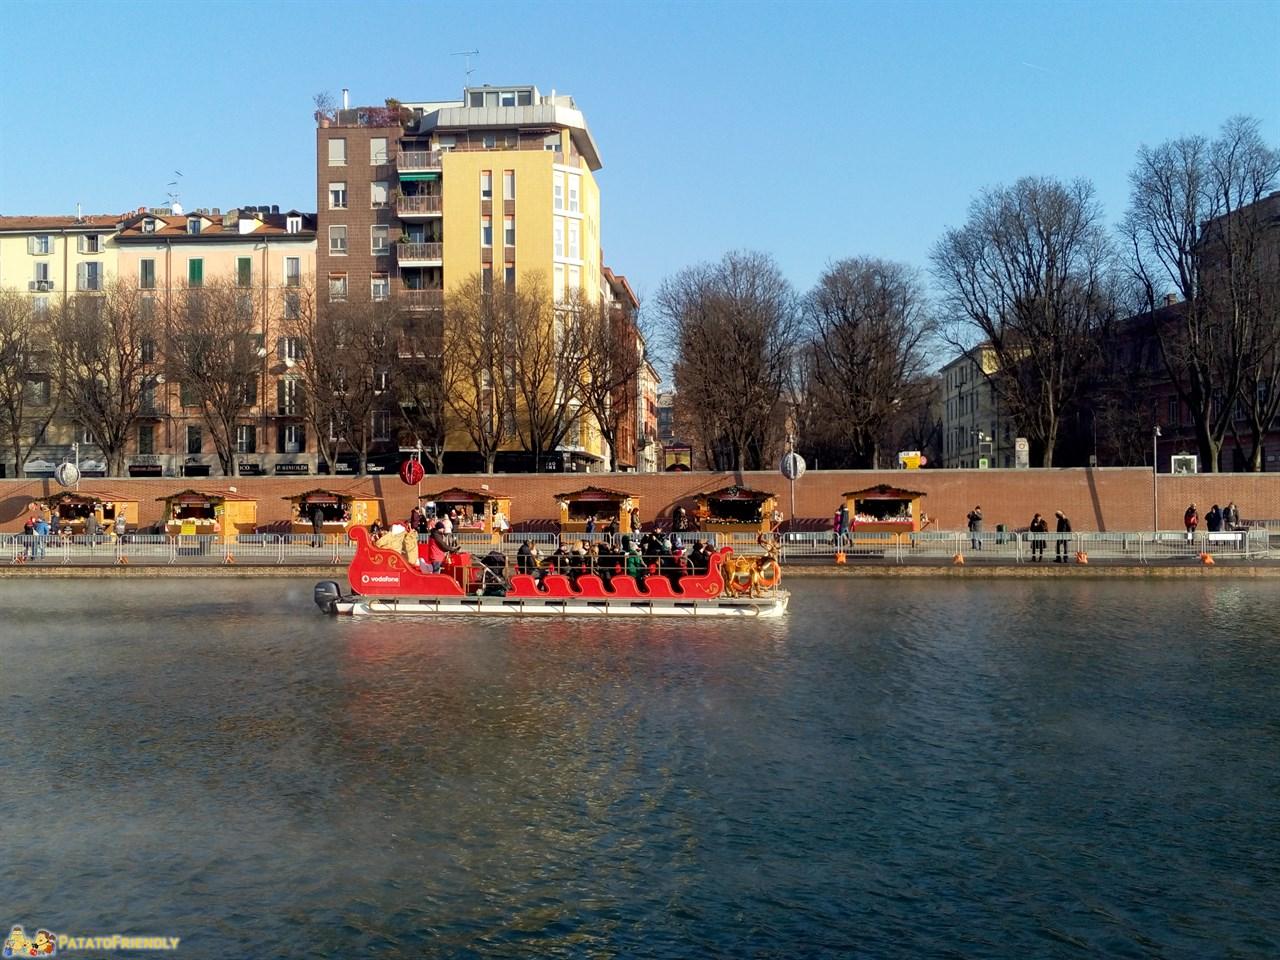 [cml_media_alt id='9034']La barca/slitta di Babbo Natale al Darsena Christmas Village Milano[/cml_media_alt]